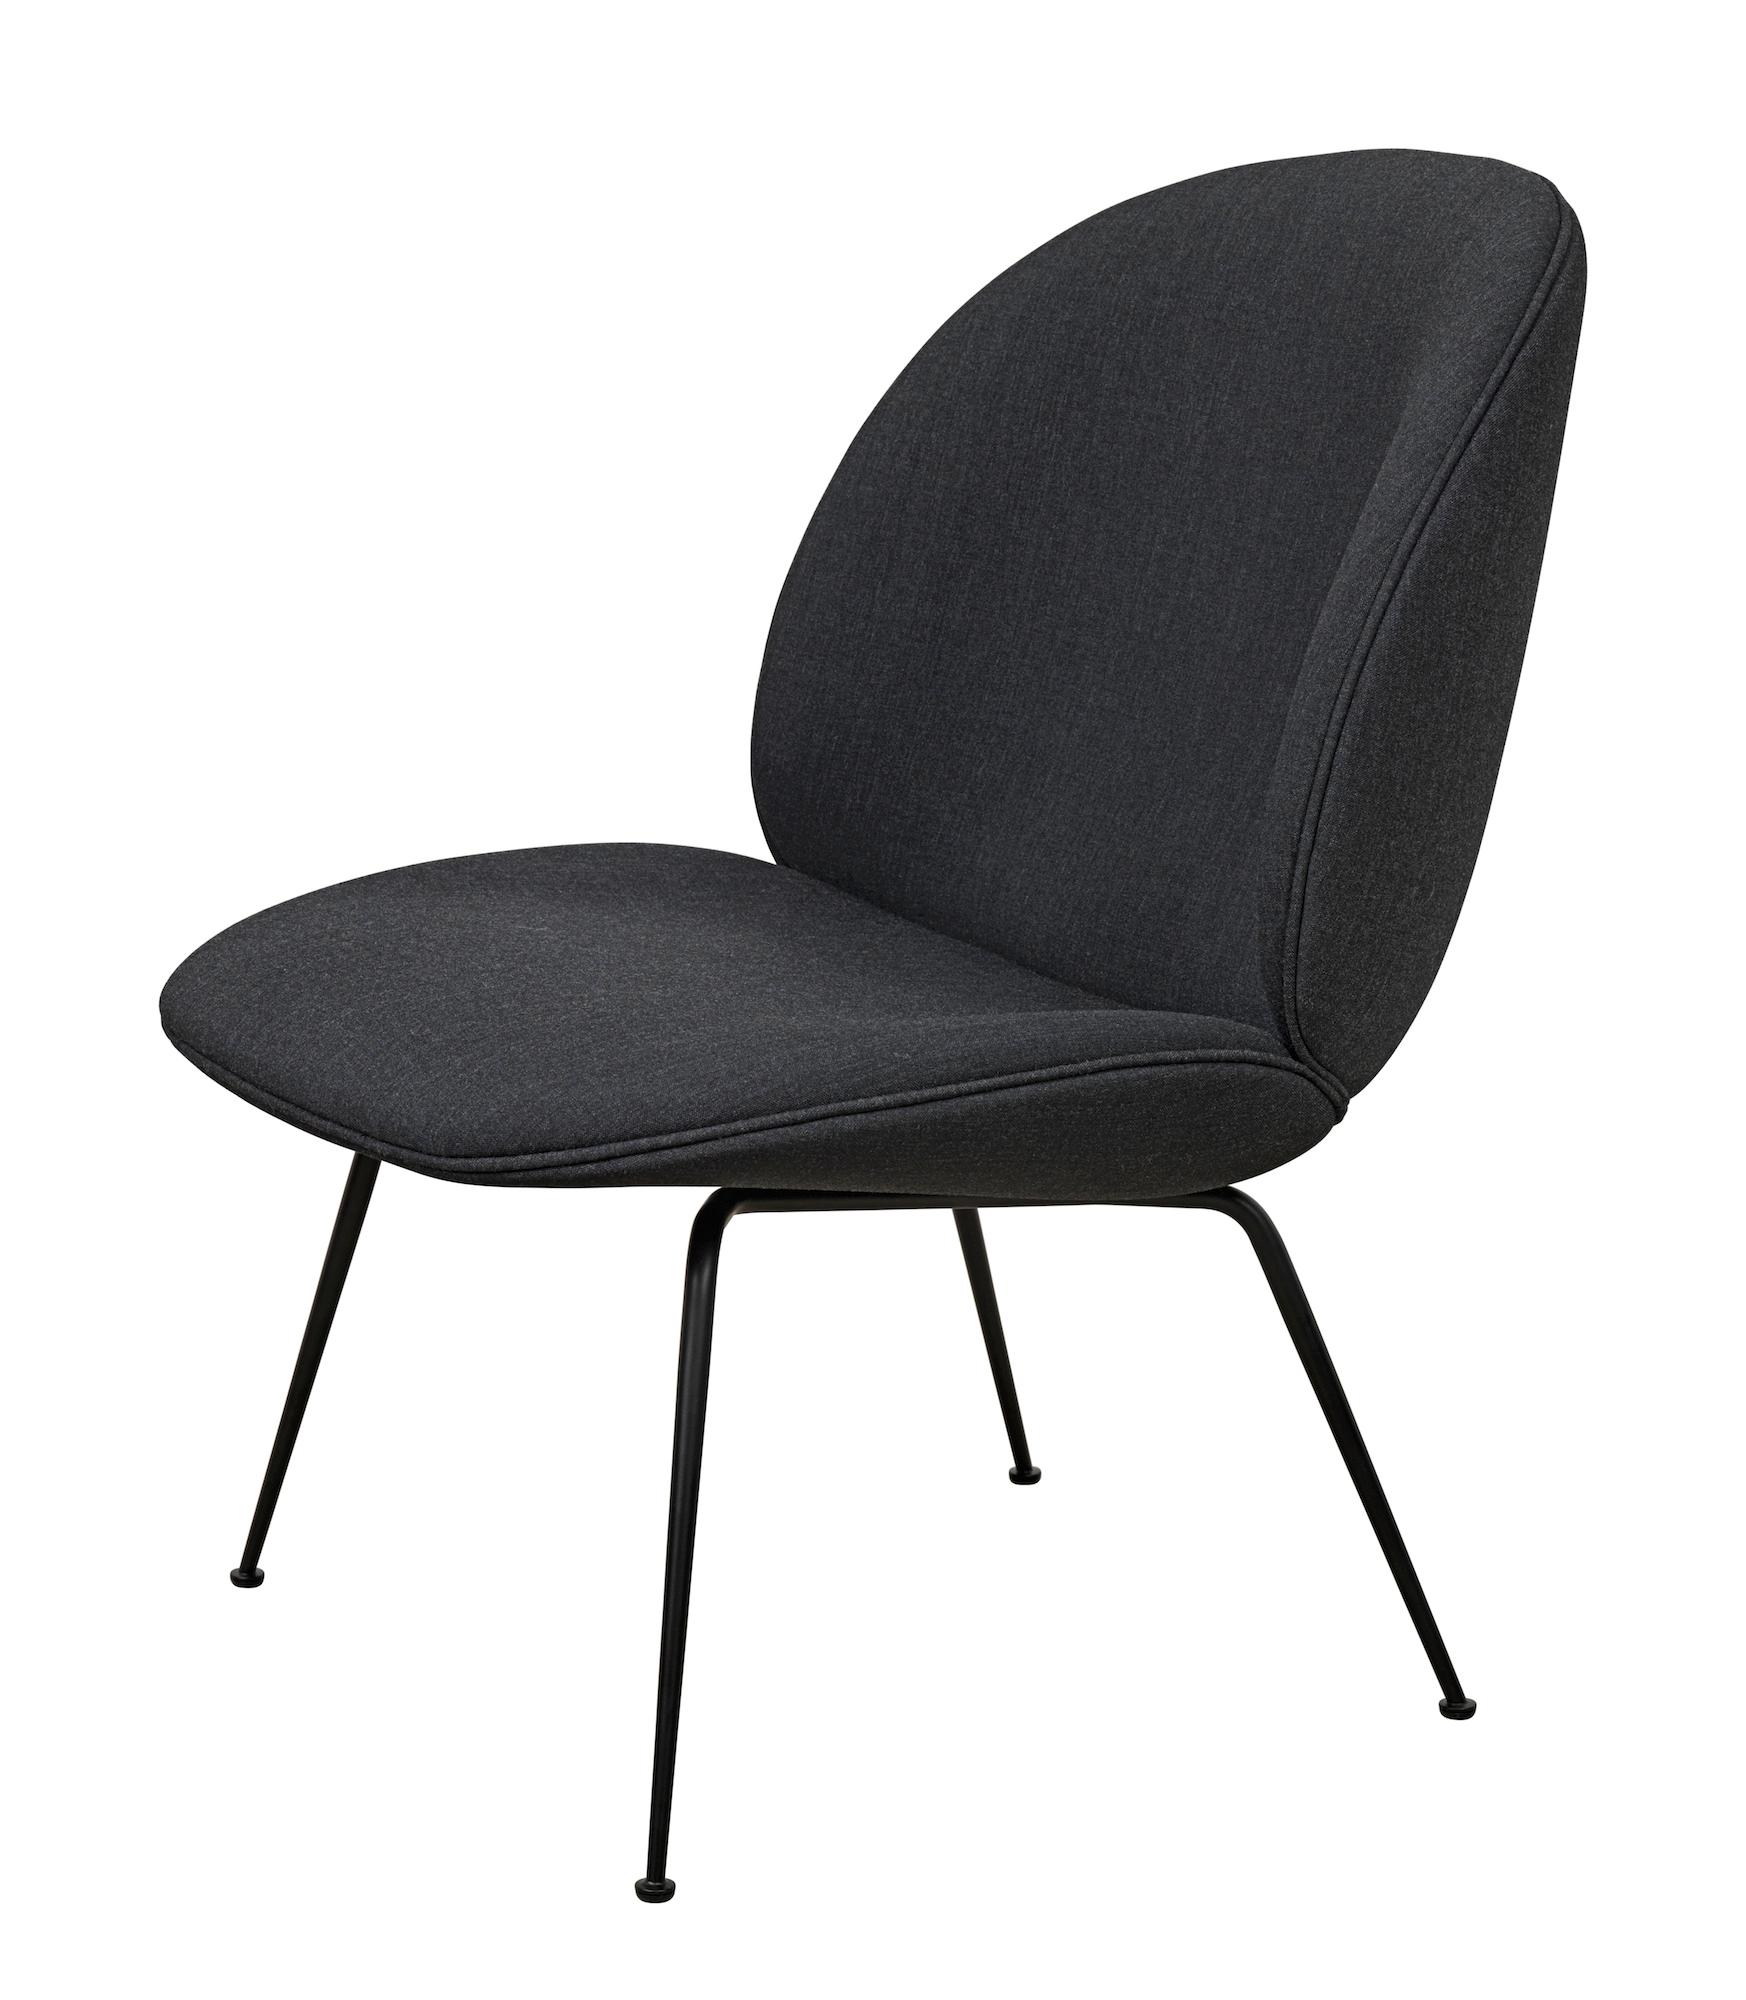 gubi beetle lounge chair gamfratesi. Black Bedroom Furniture Sets. Home Design Ideas